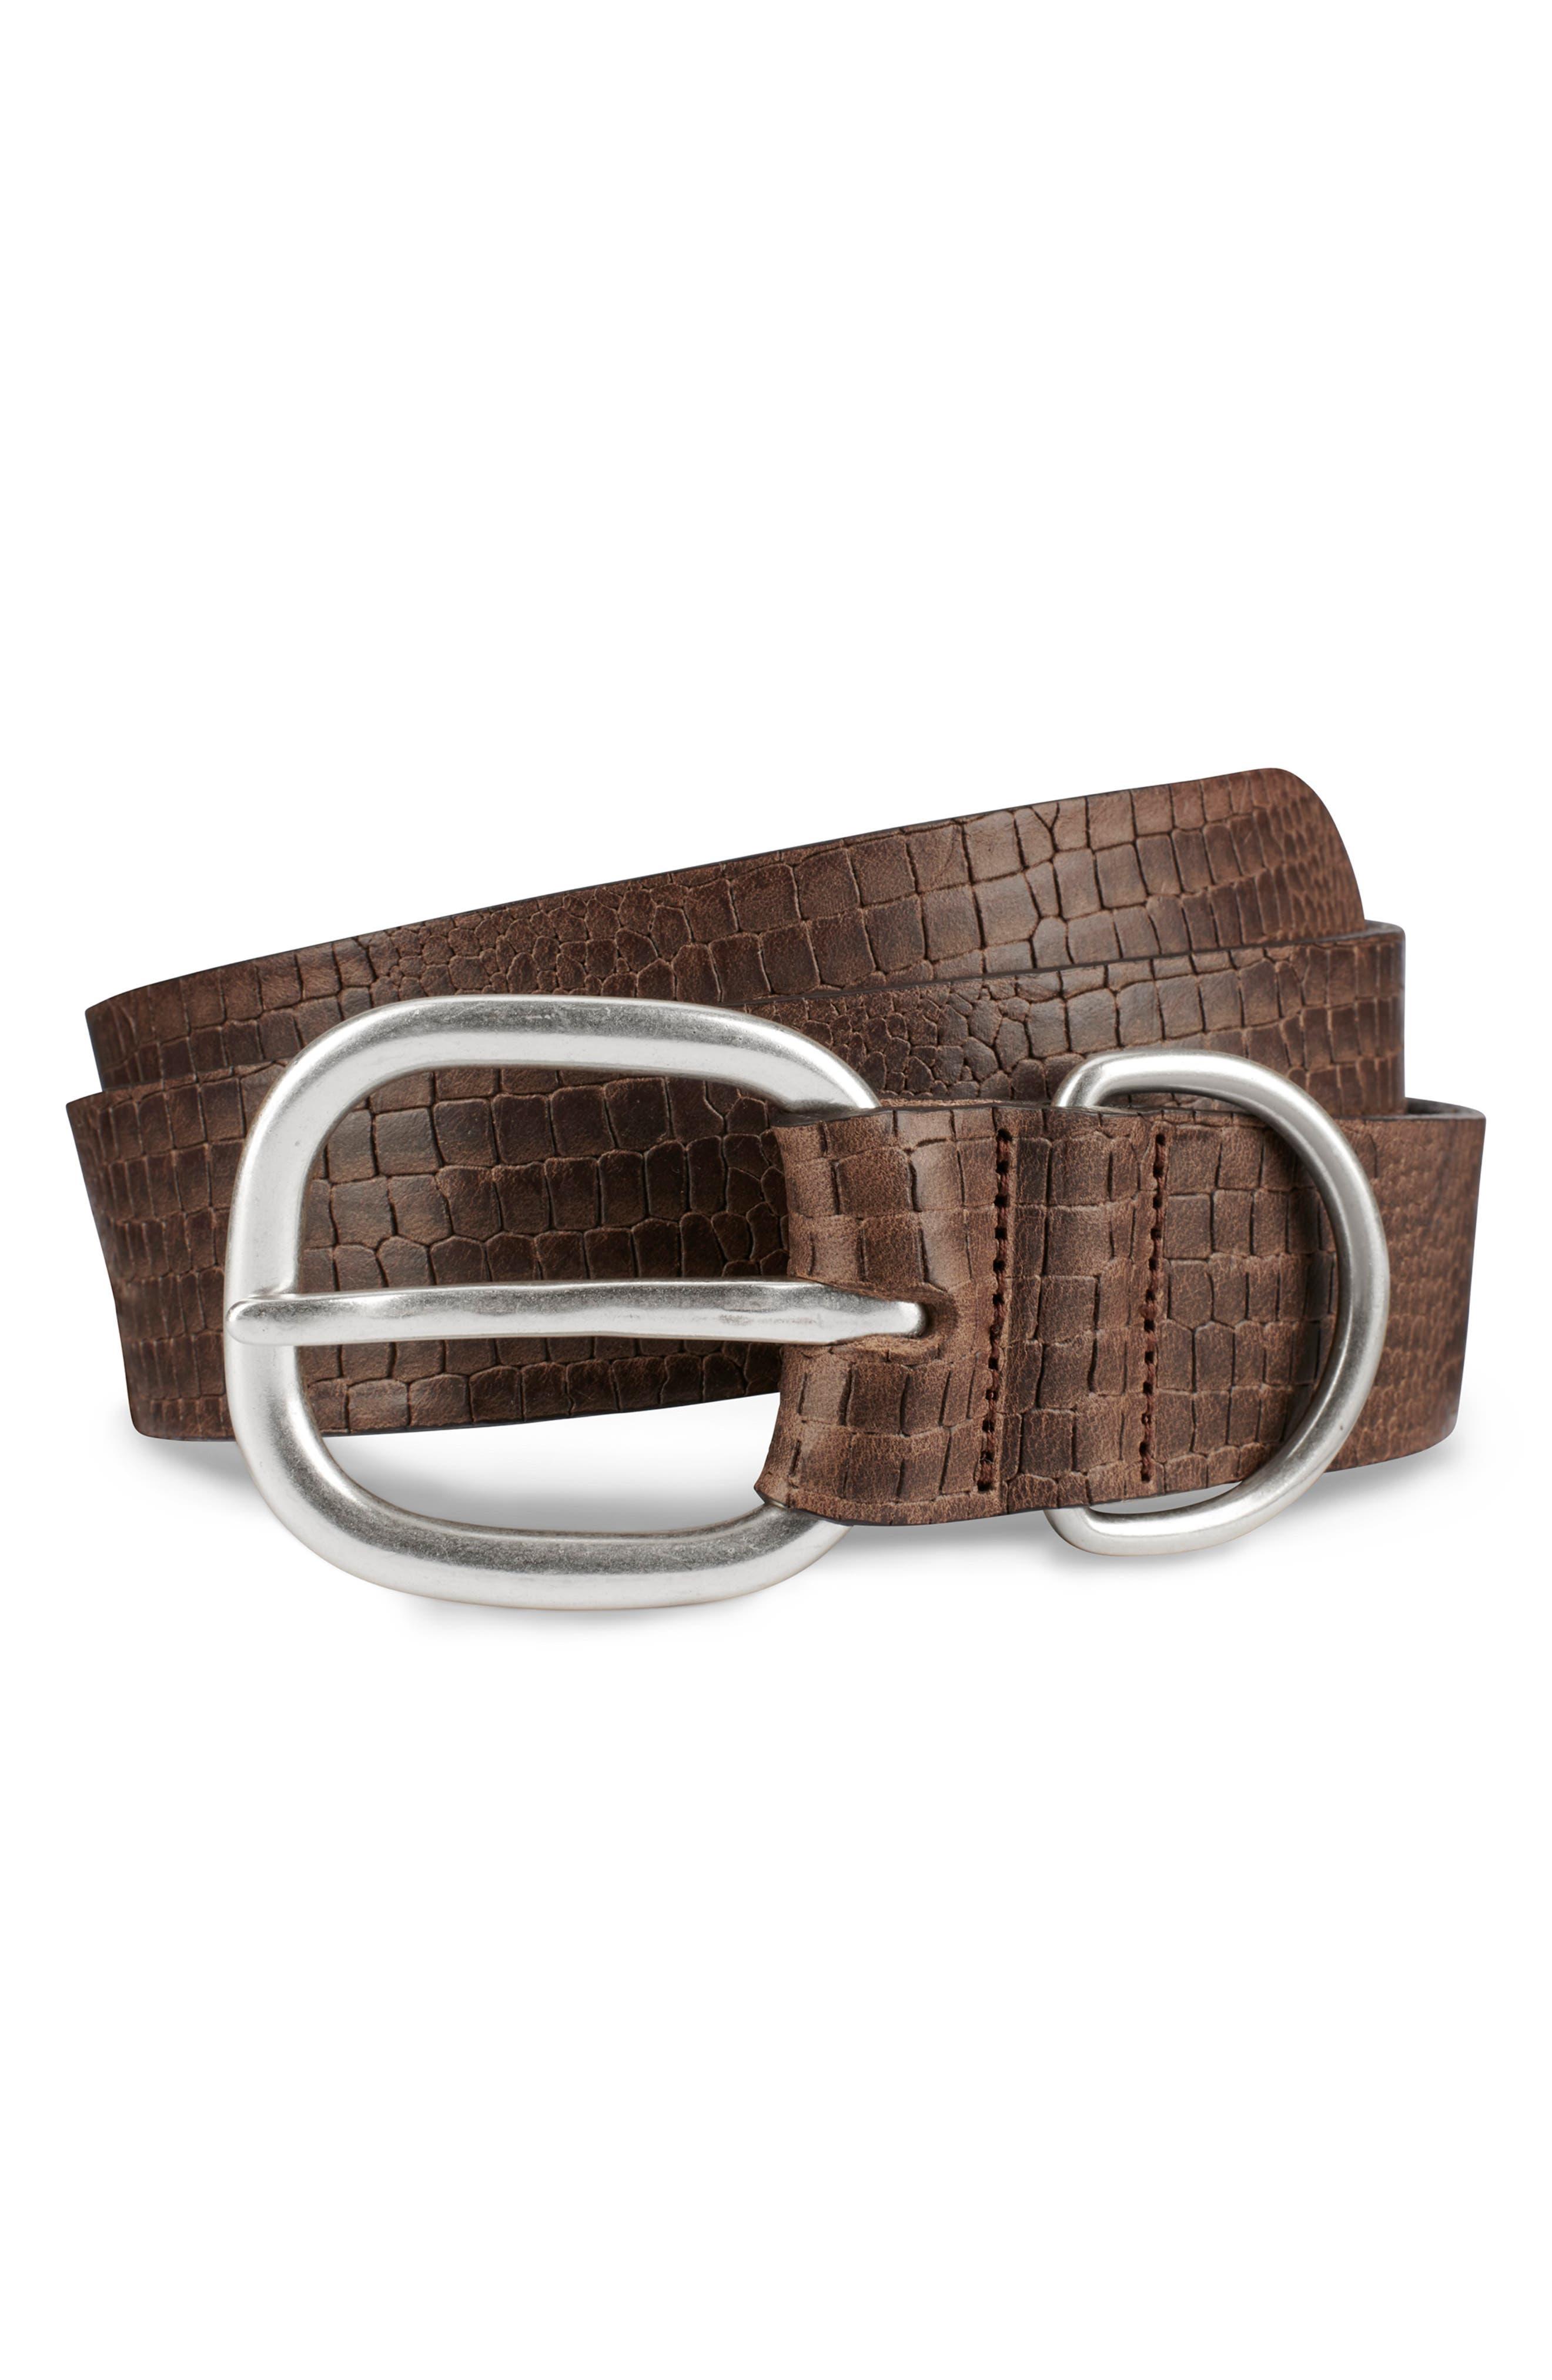 Allen Edmonds Croco Print Leather Belt, Natural